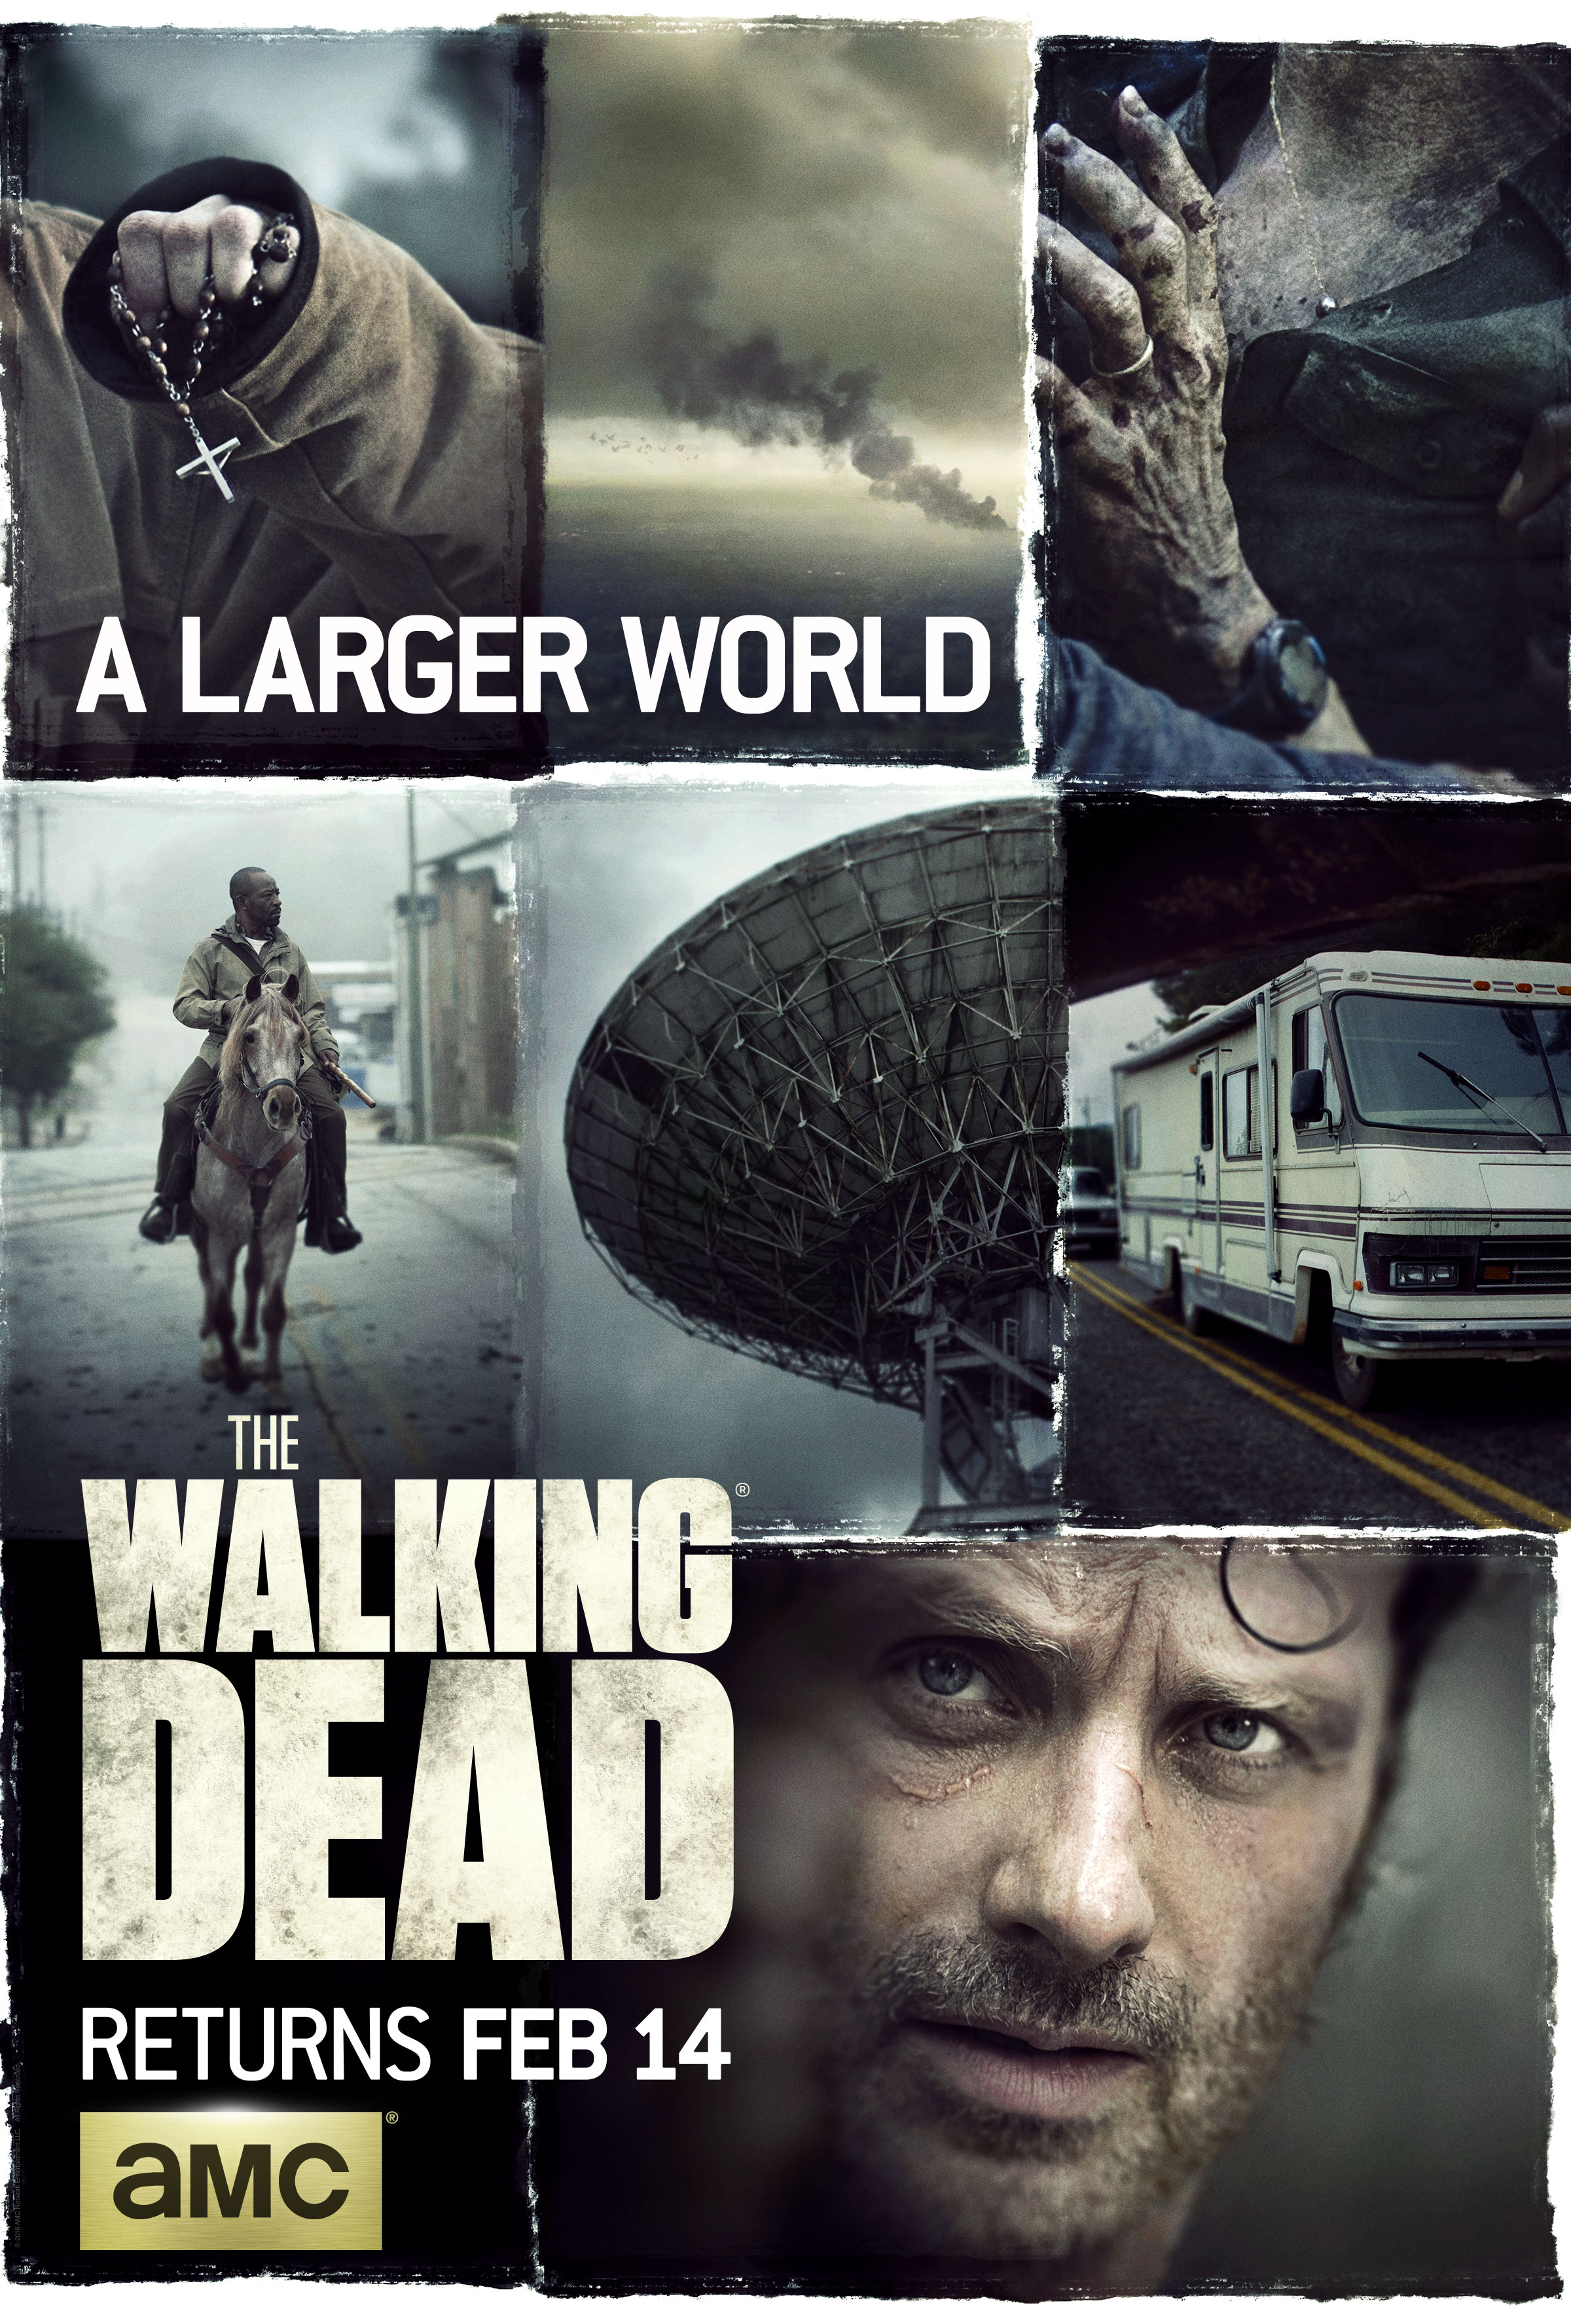 blogs the walking dead the walking dead season 6 mid season premiere poster revealed amc. Black Bedroom Furniture Sets. Home Design Ideas